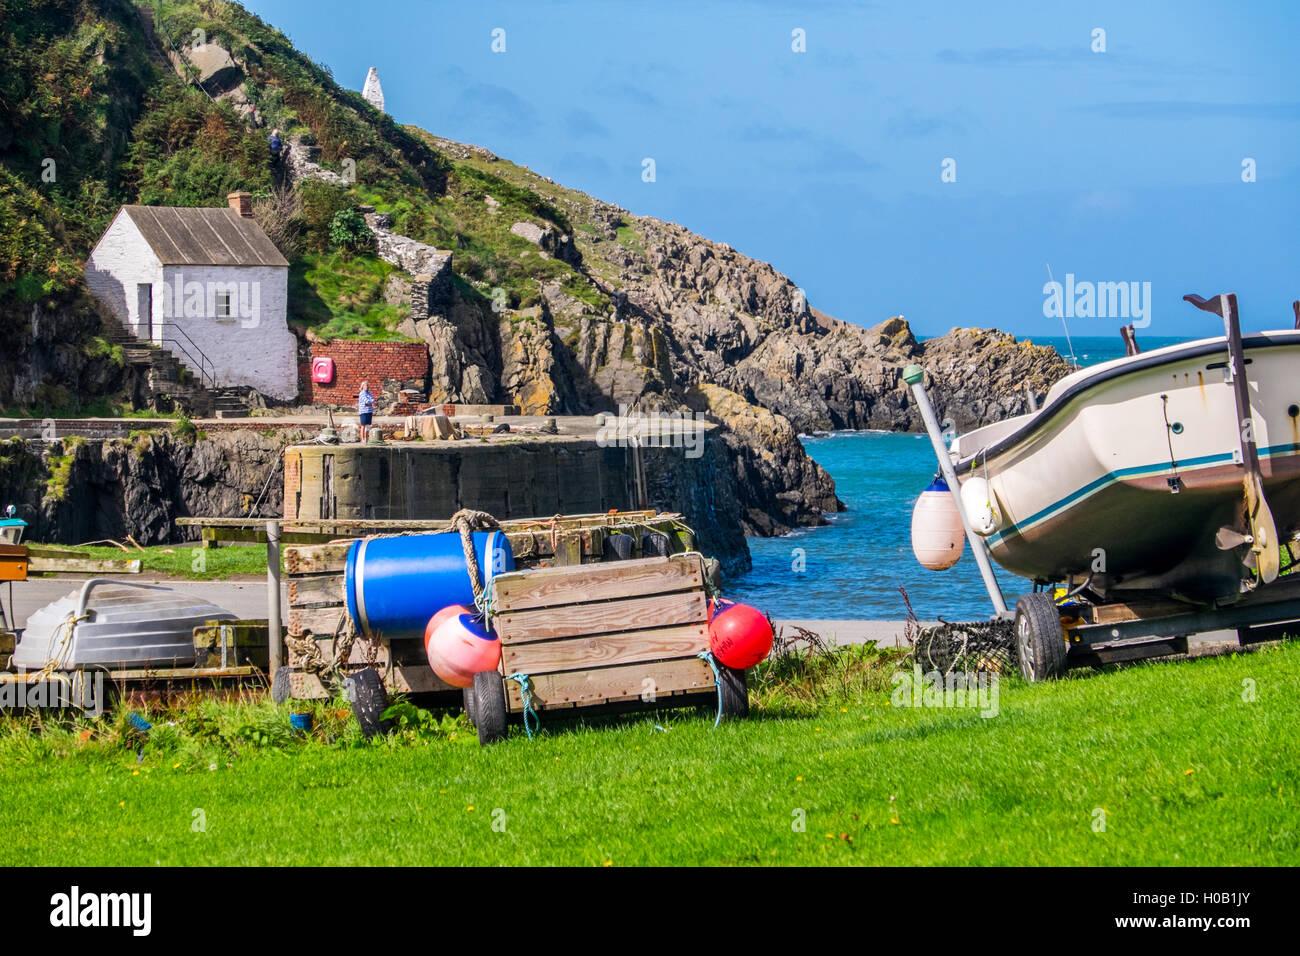 Porthgain Harbour on the Pembrokeshire Coast - Stock Image